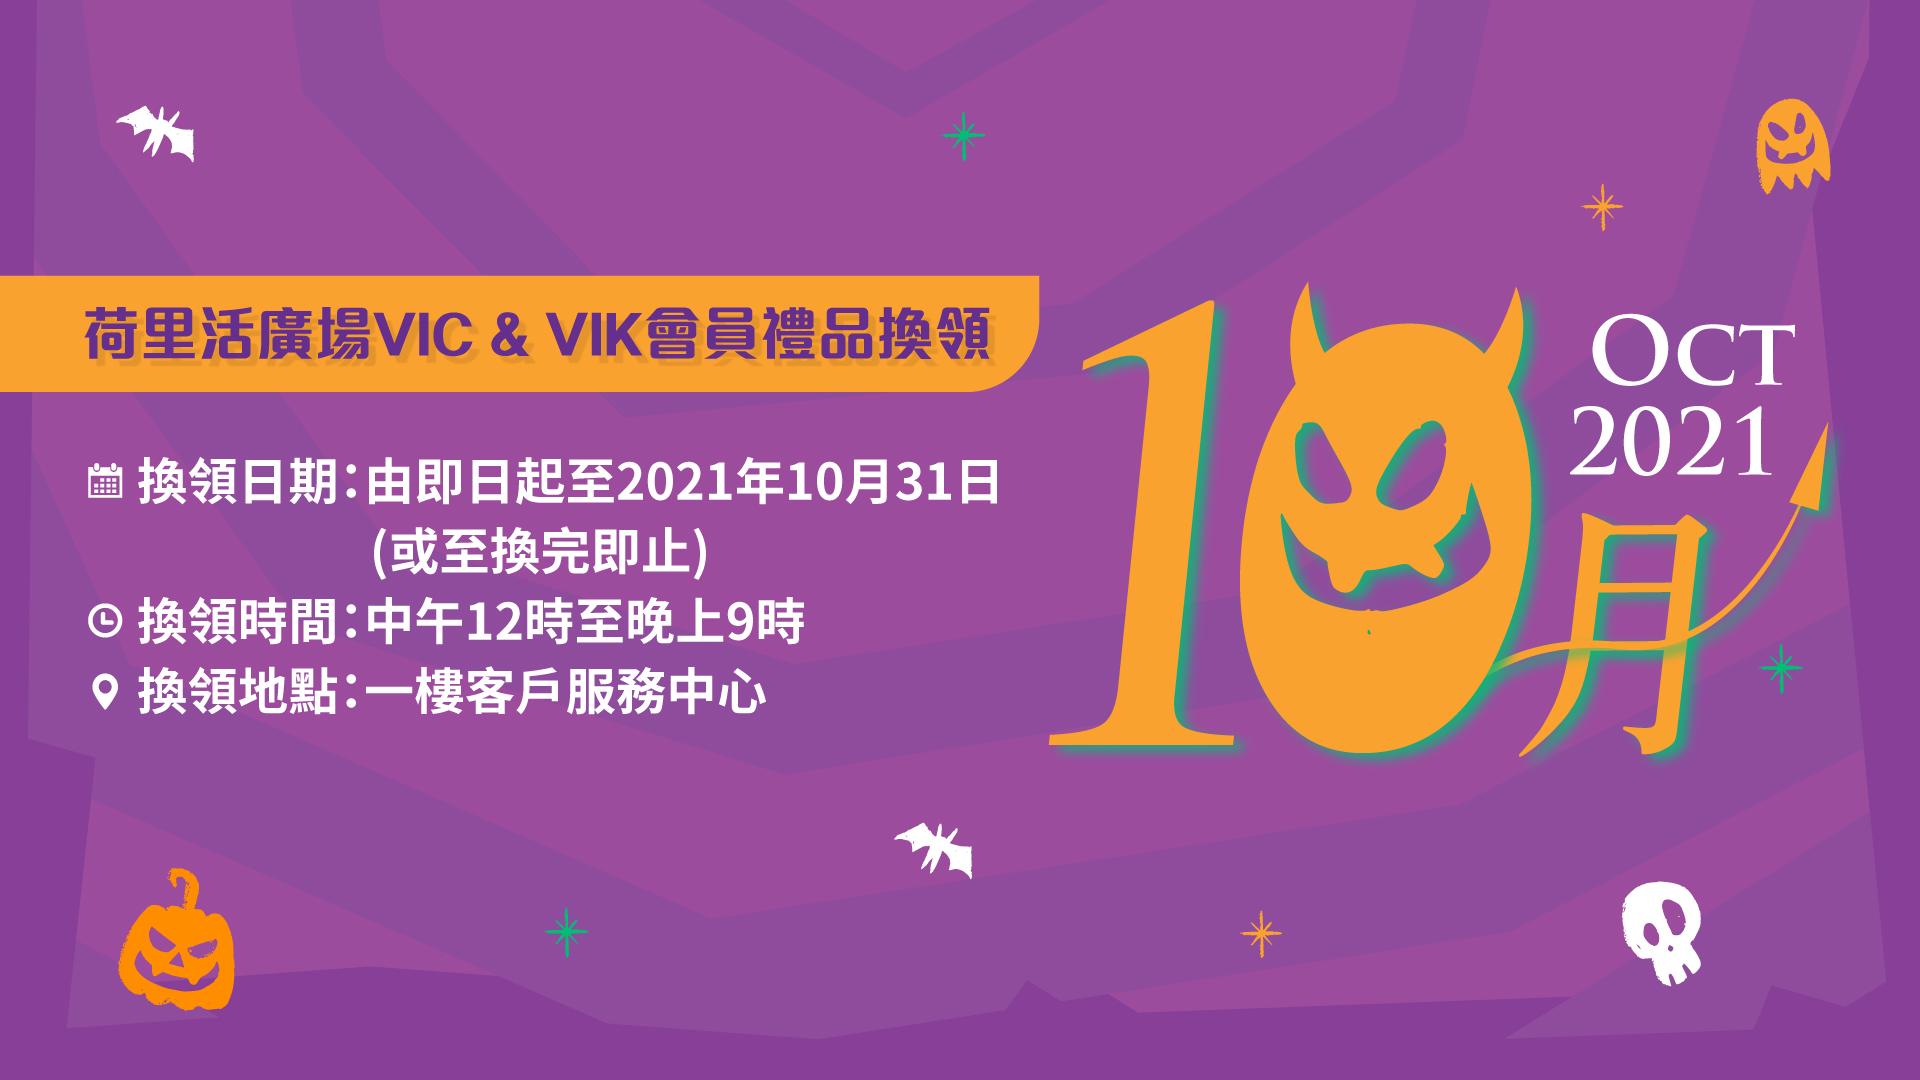 VIC & VIK 10月會員禮品換領